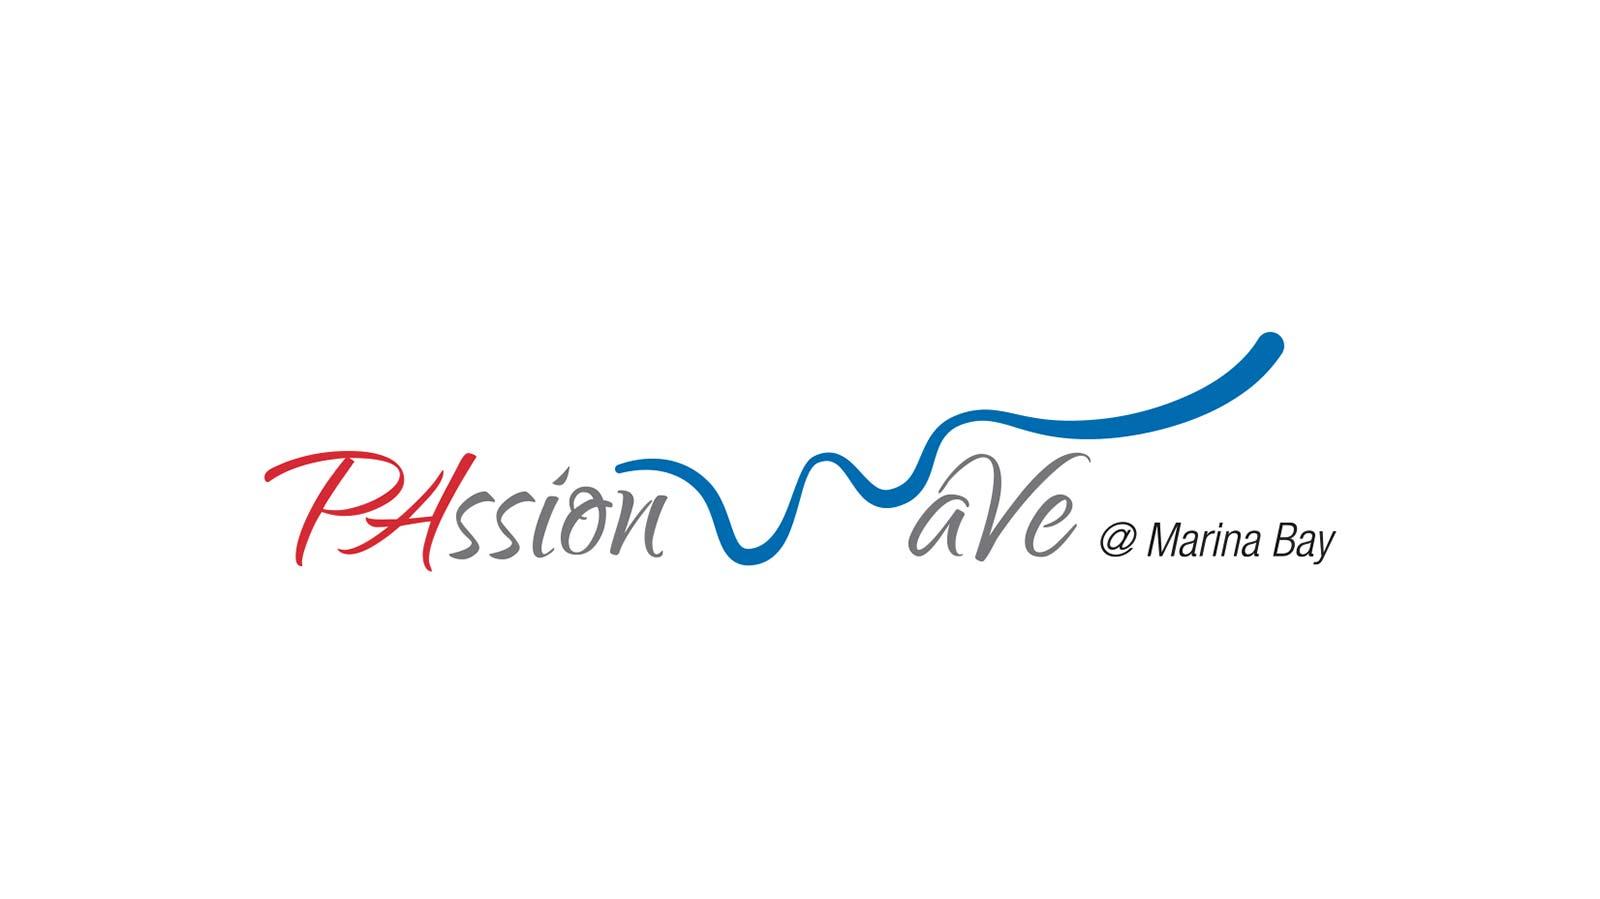 PAssion WaVe Marina Bay Logo Design